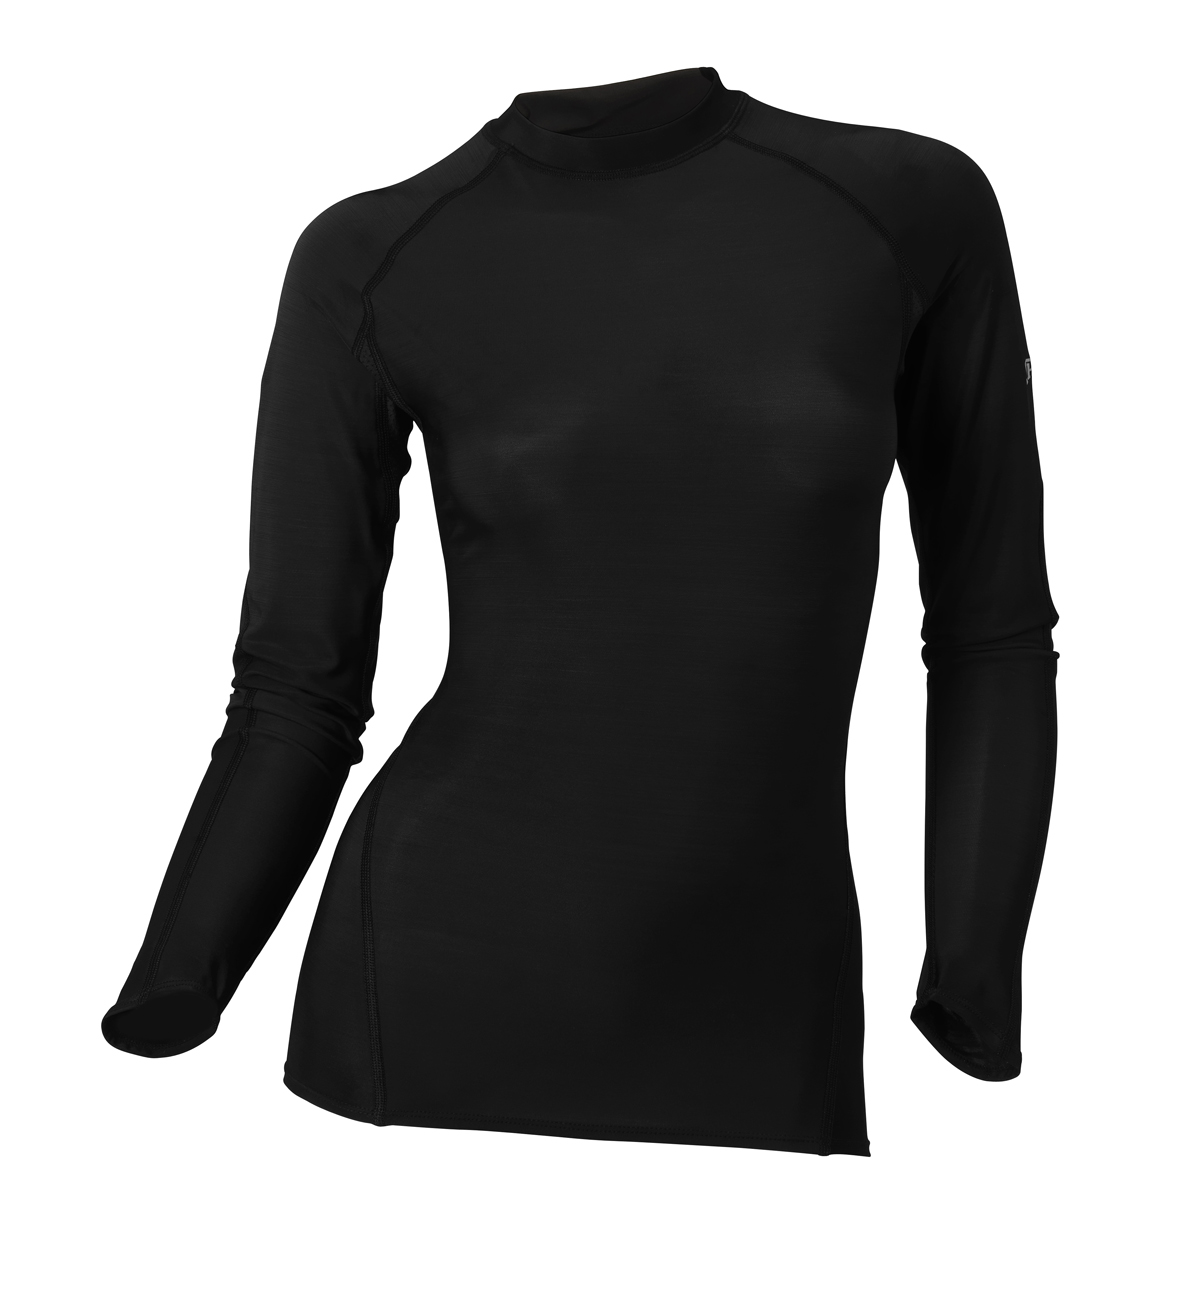 Spalding Dames Base layer long sleeve Zwart